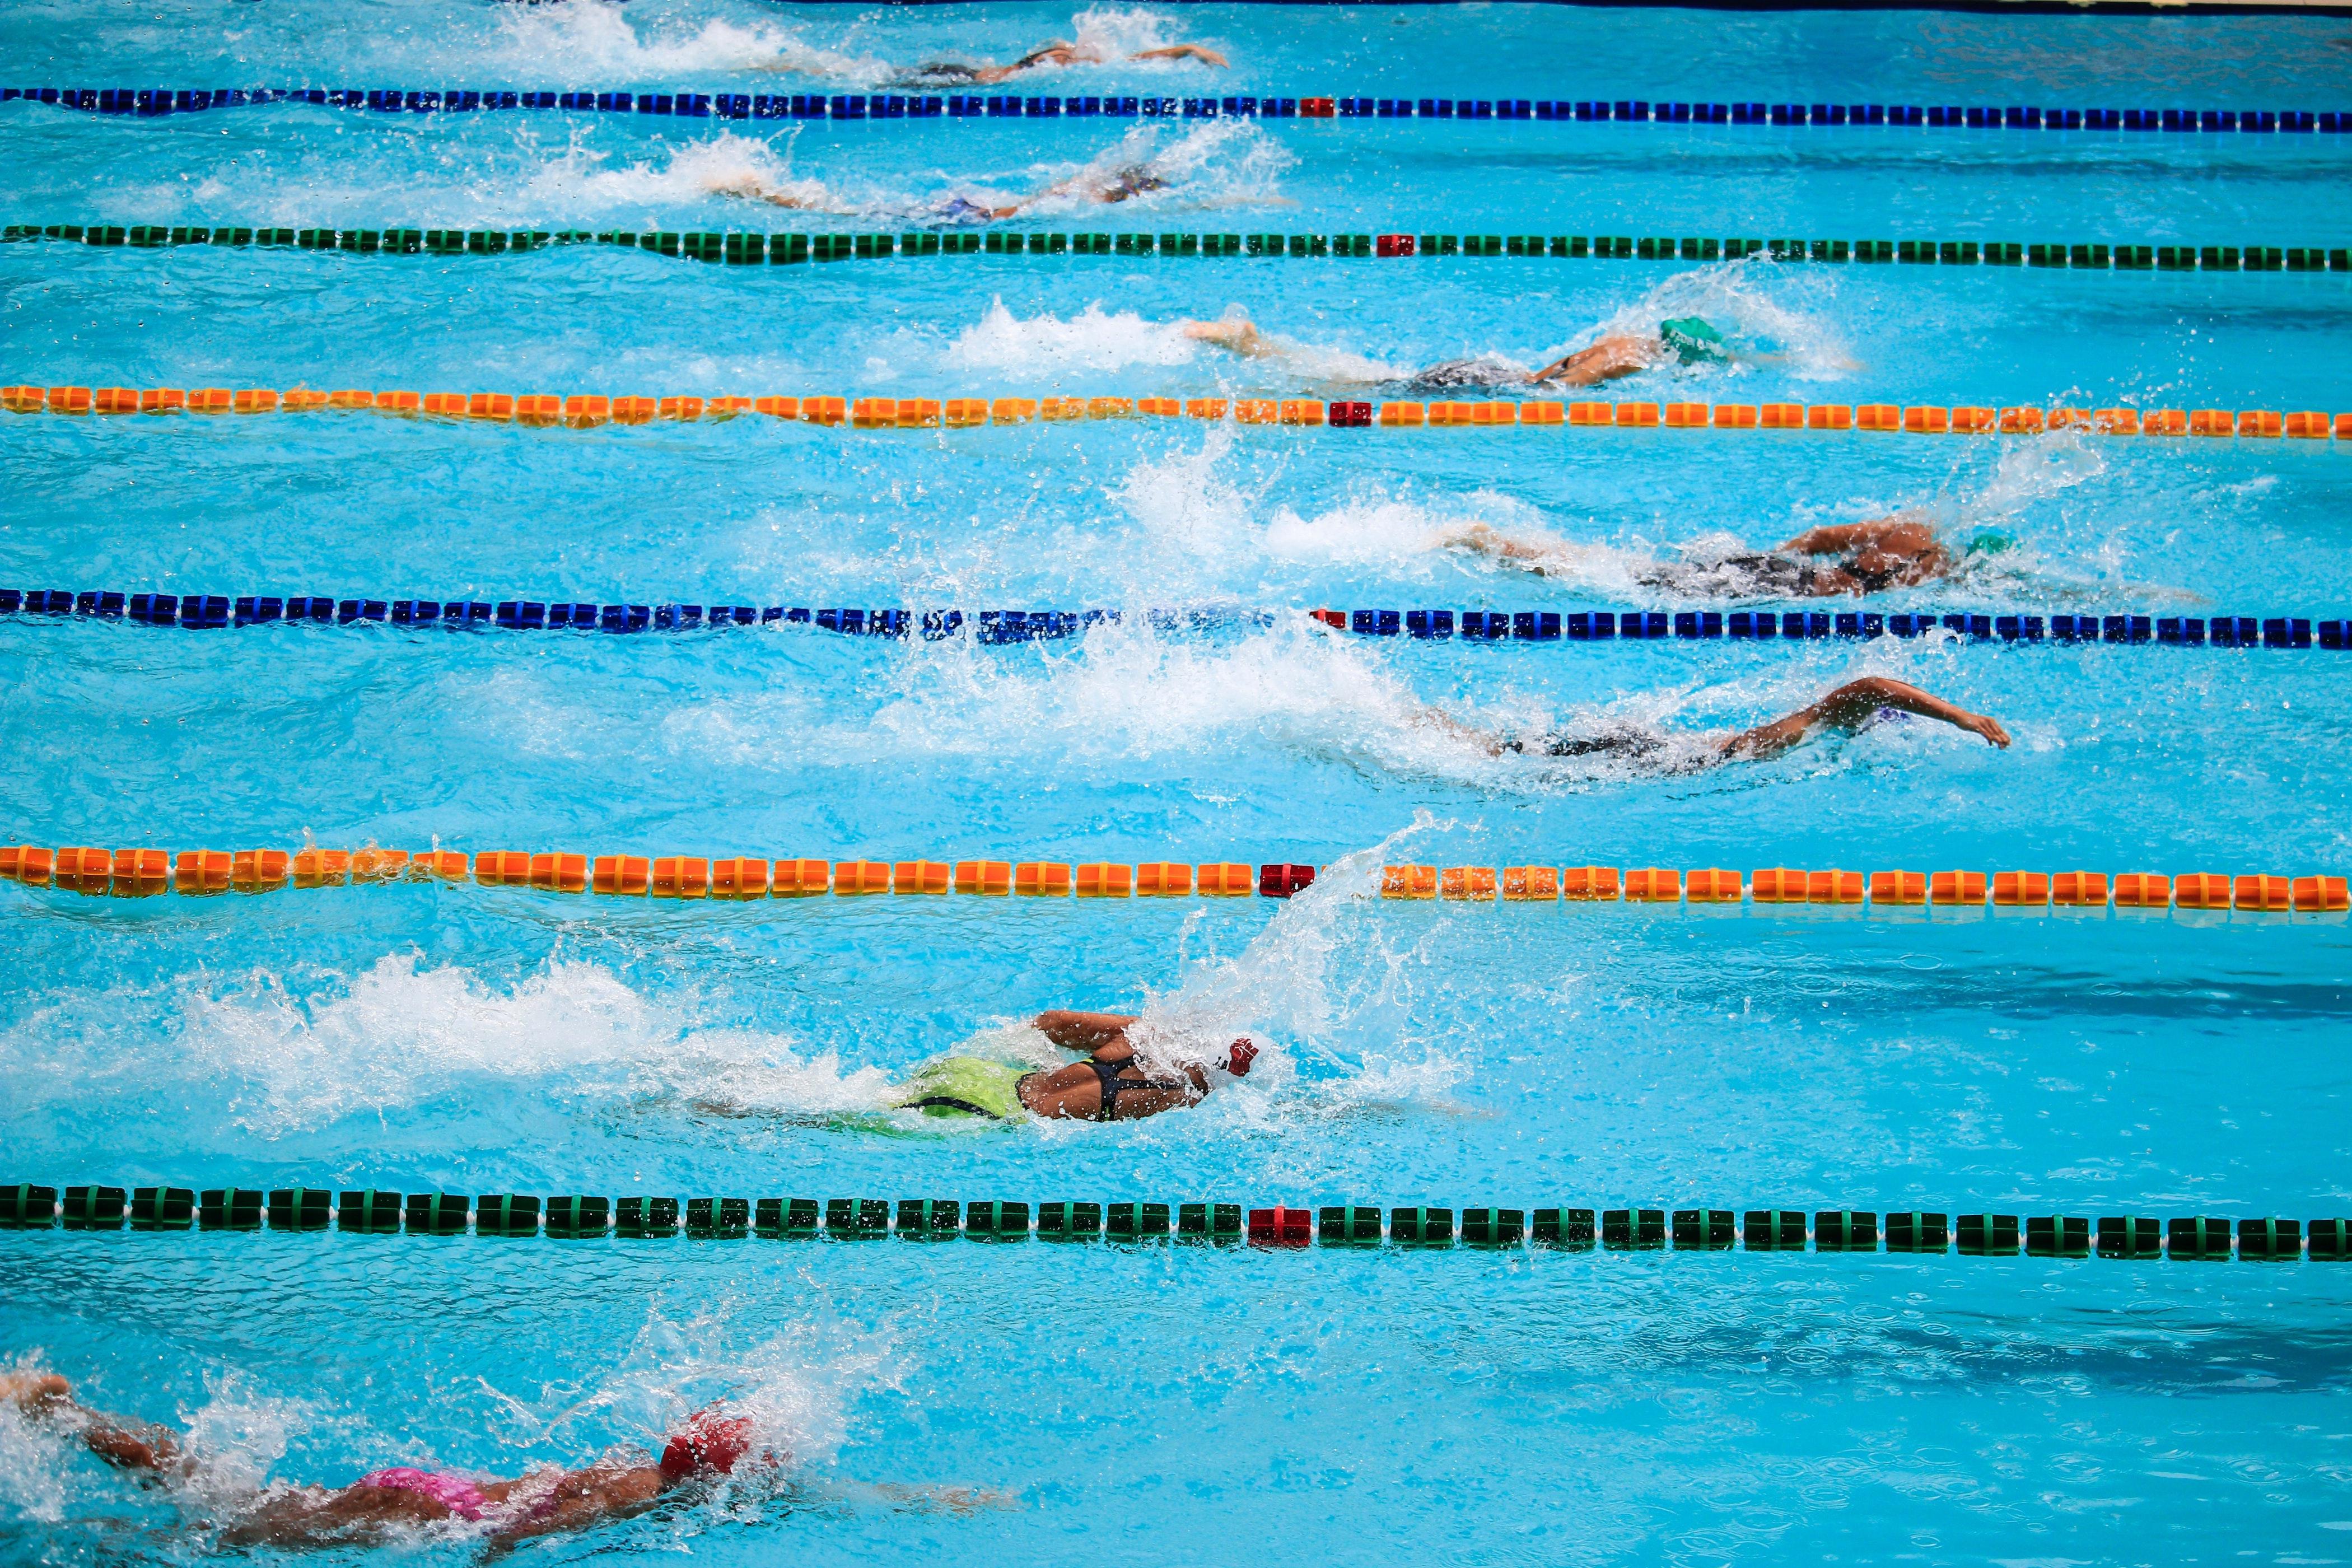 Swimming pool lengths